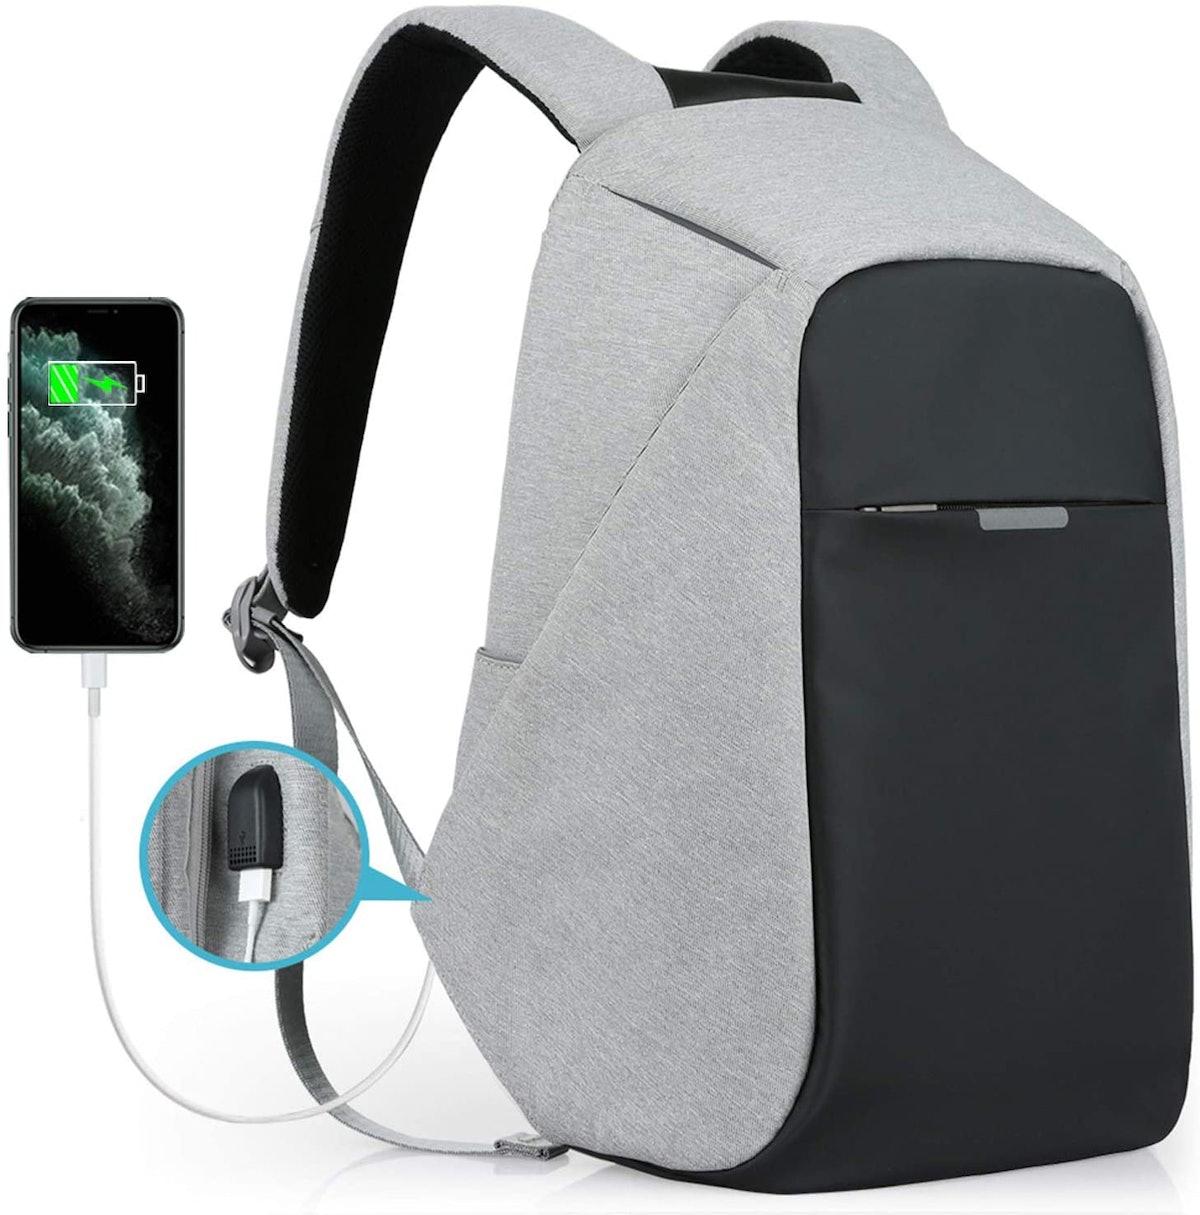 Oscaurt Anti-theft Travel Laptop Backpack